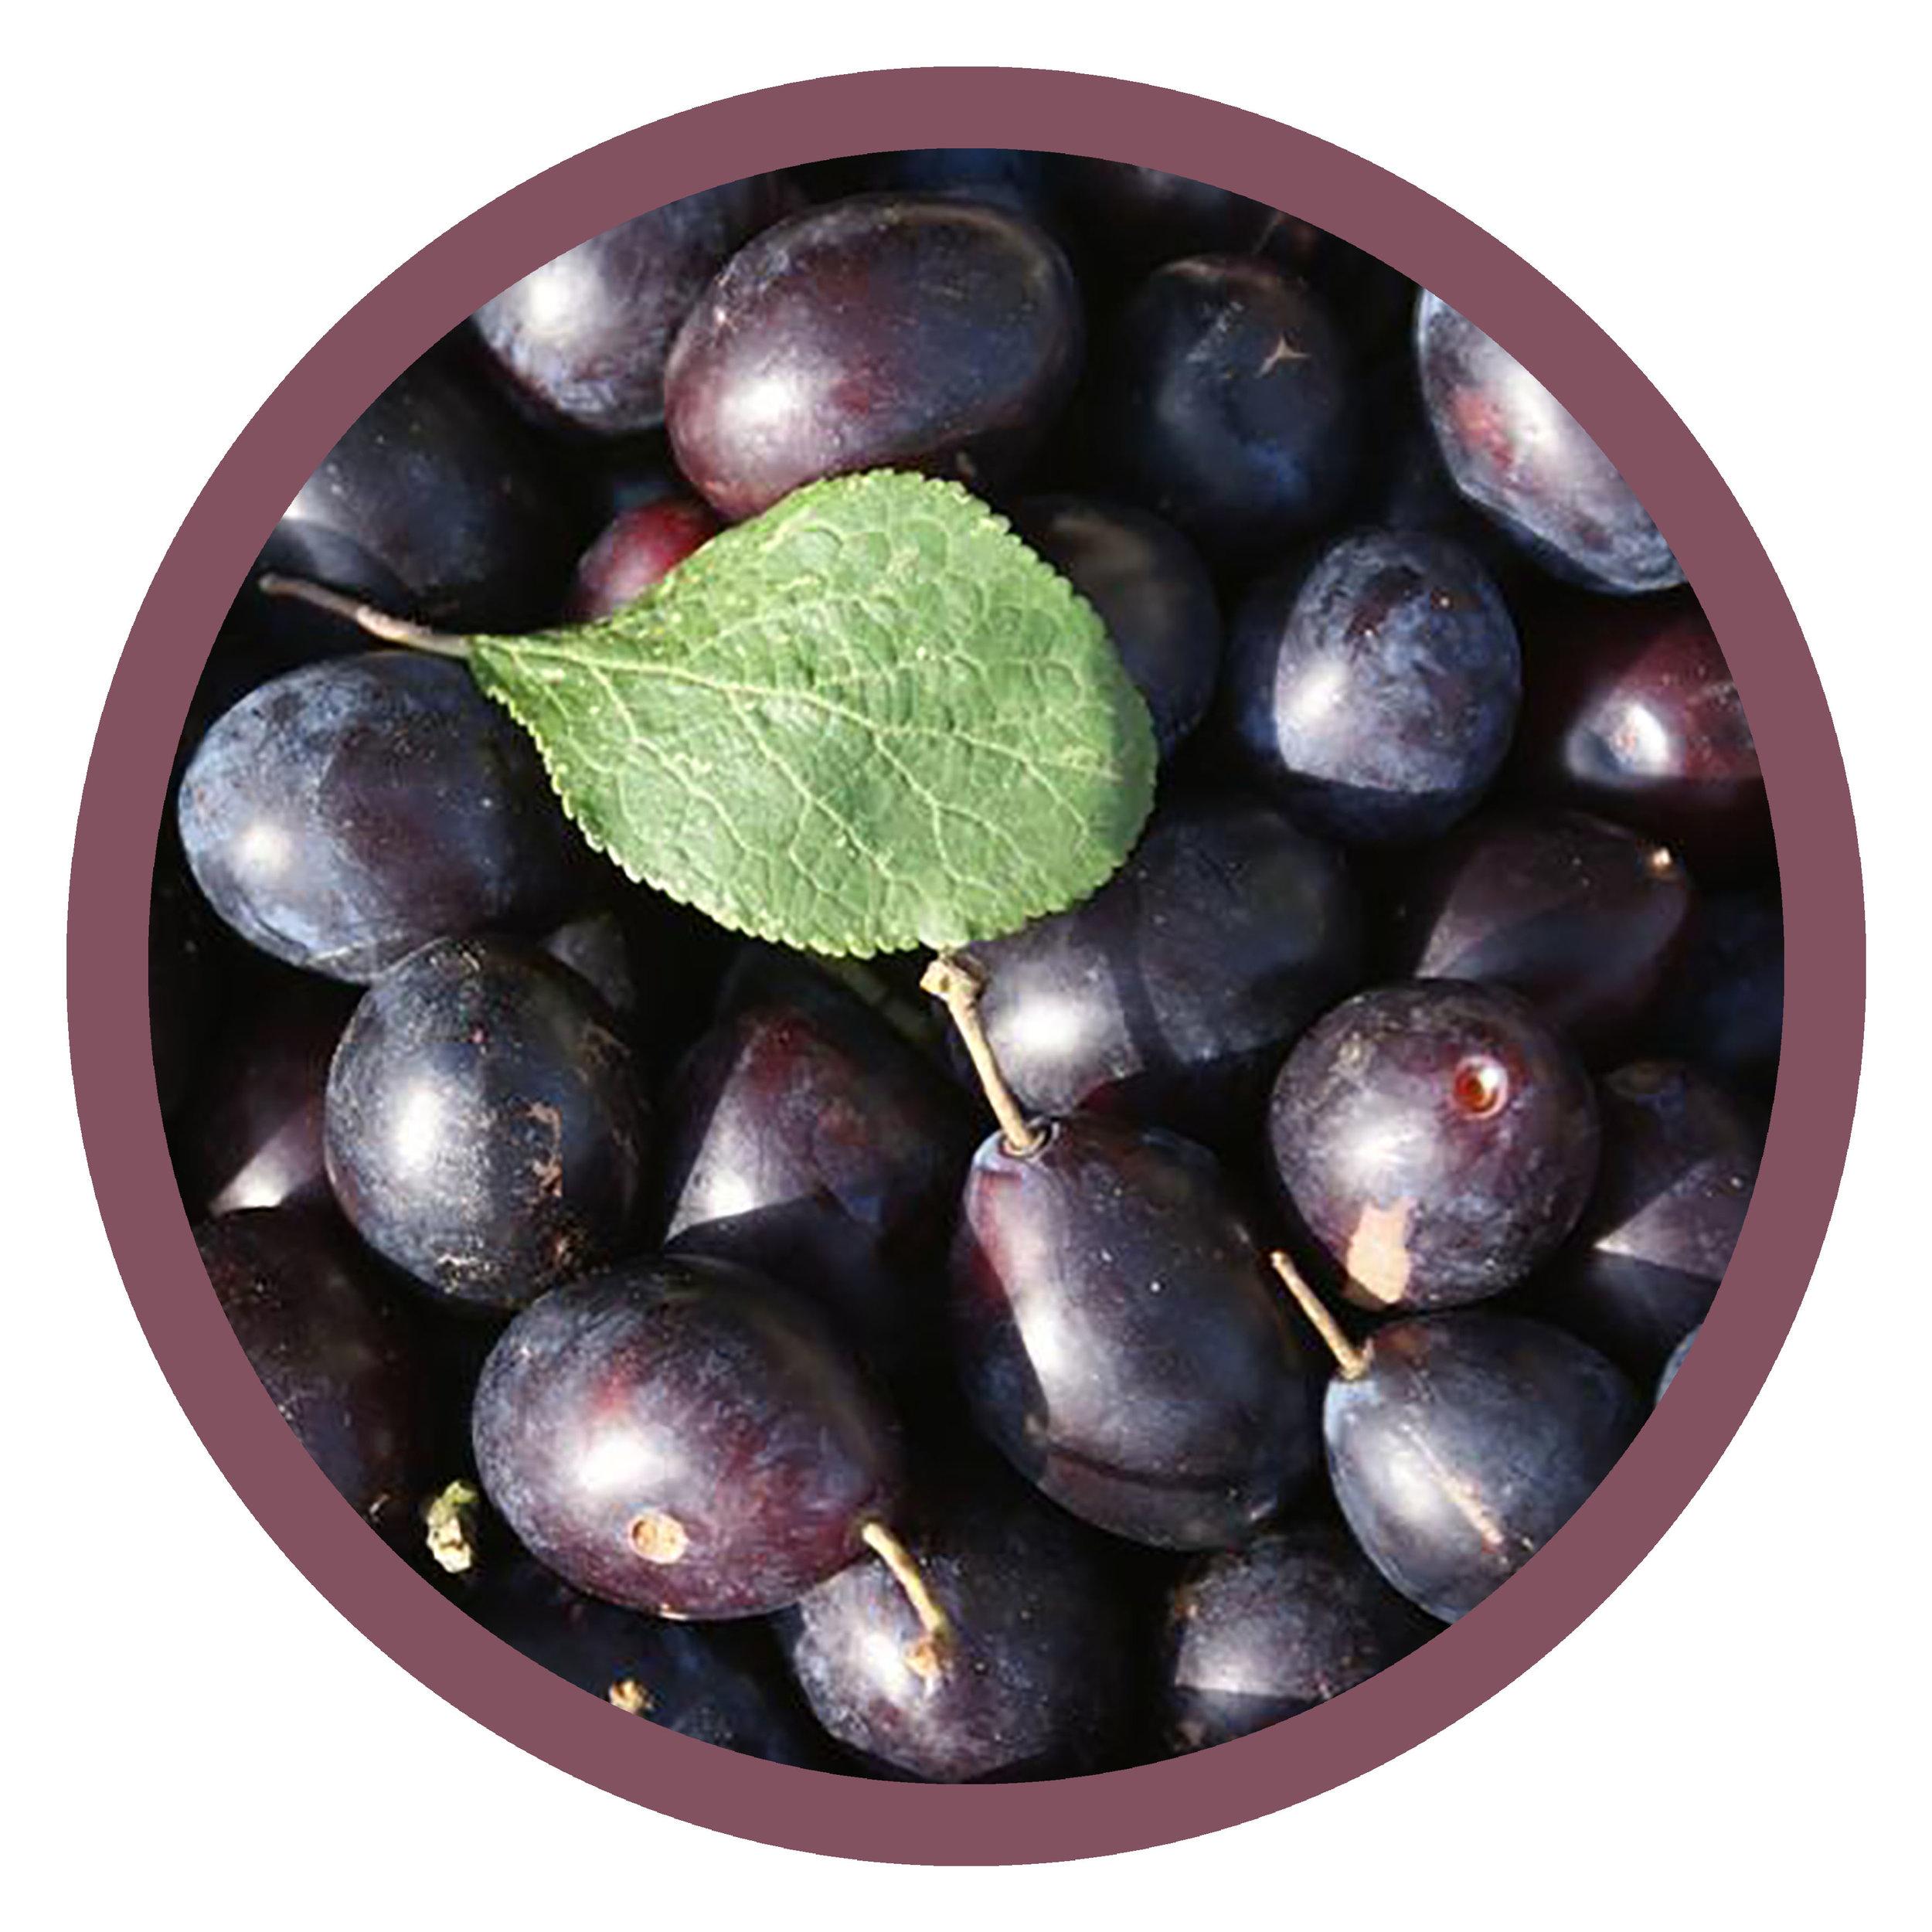 plums round.jpg